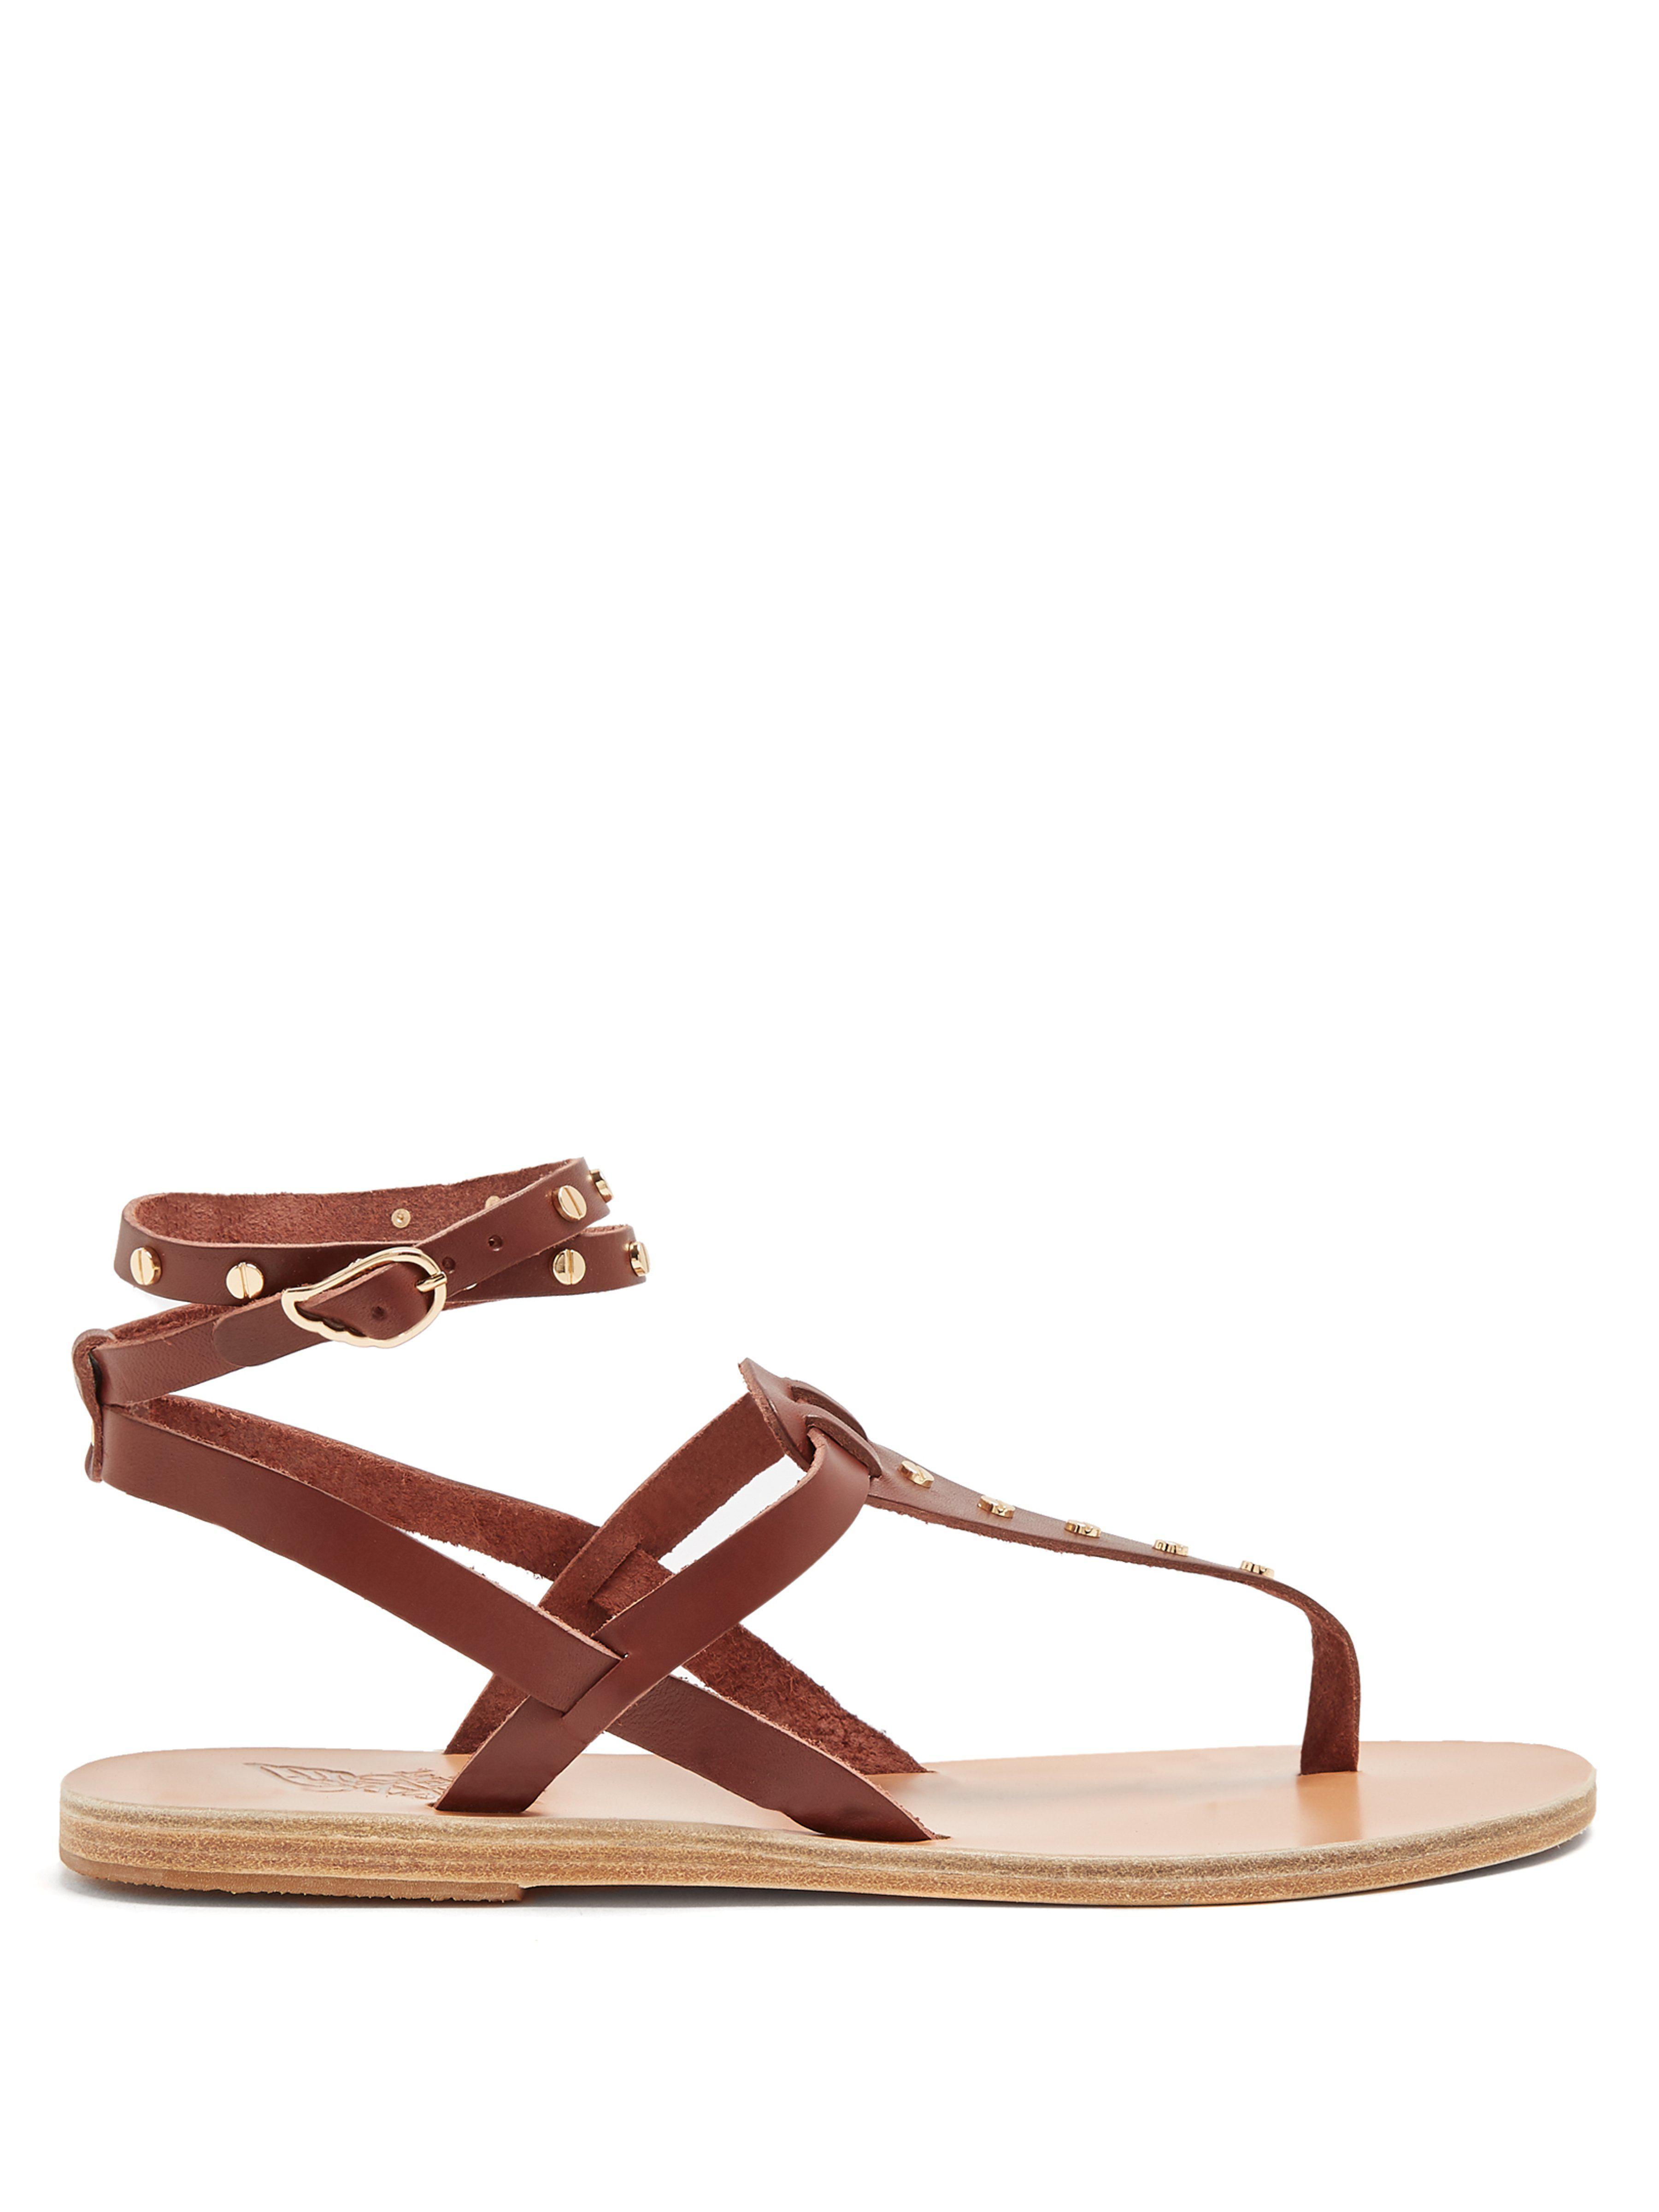 24931e8acabe5f Ancient Greek Sandals. Women s Brown Estia Nails Embellished Leather Sandals